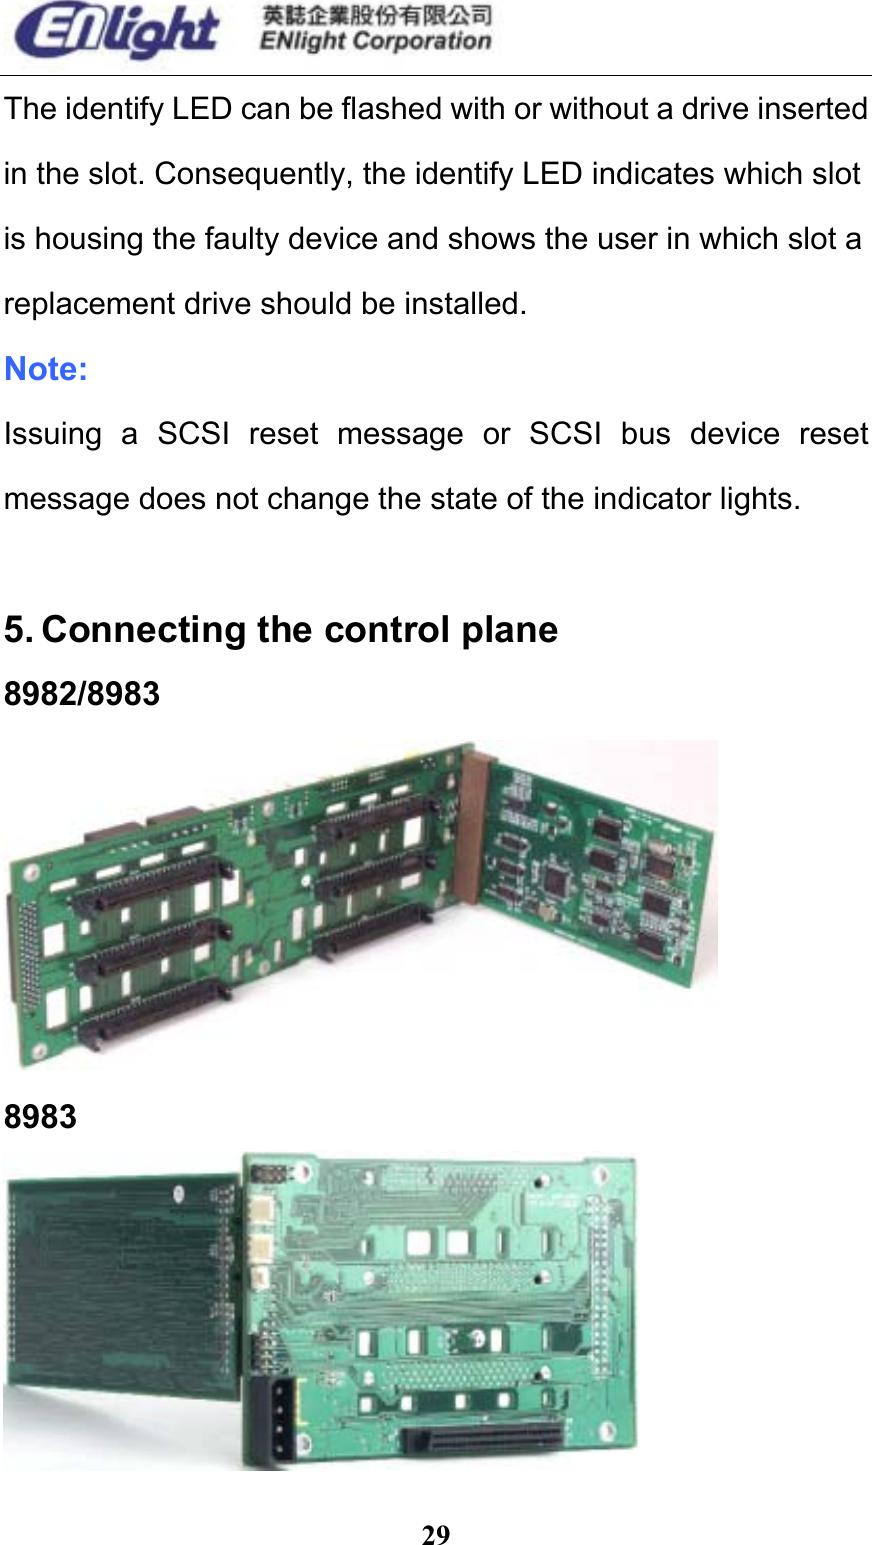 DRIVER UPDATE: ENLIGHT 8721 SCSI PROCESSOR DEVICE